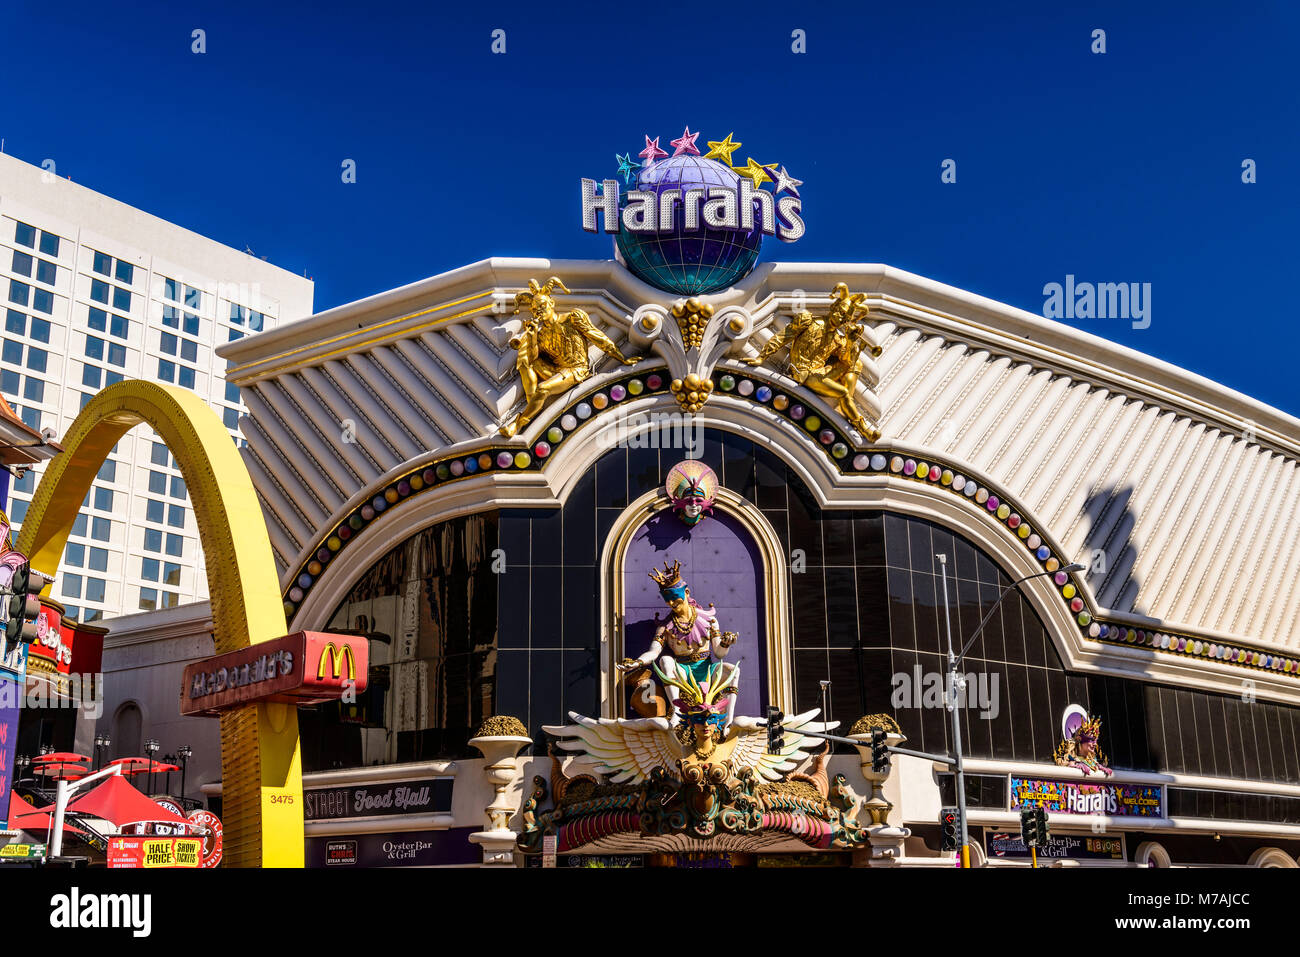 The USA, Nevada, Clark County, Las Vegas, Las Vegas Boulevard, The Strip, Harrah's, entrance - Stock Image